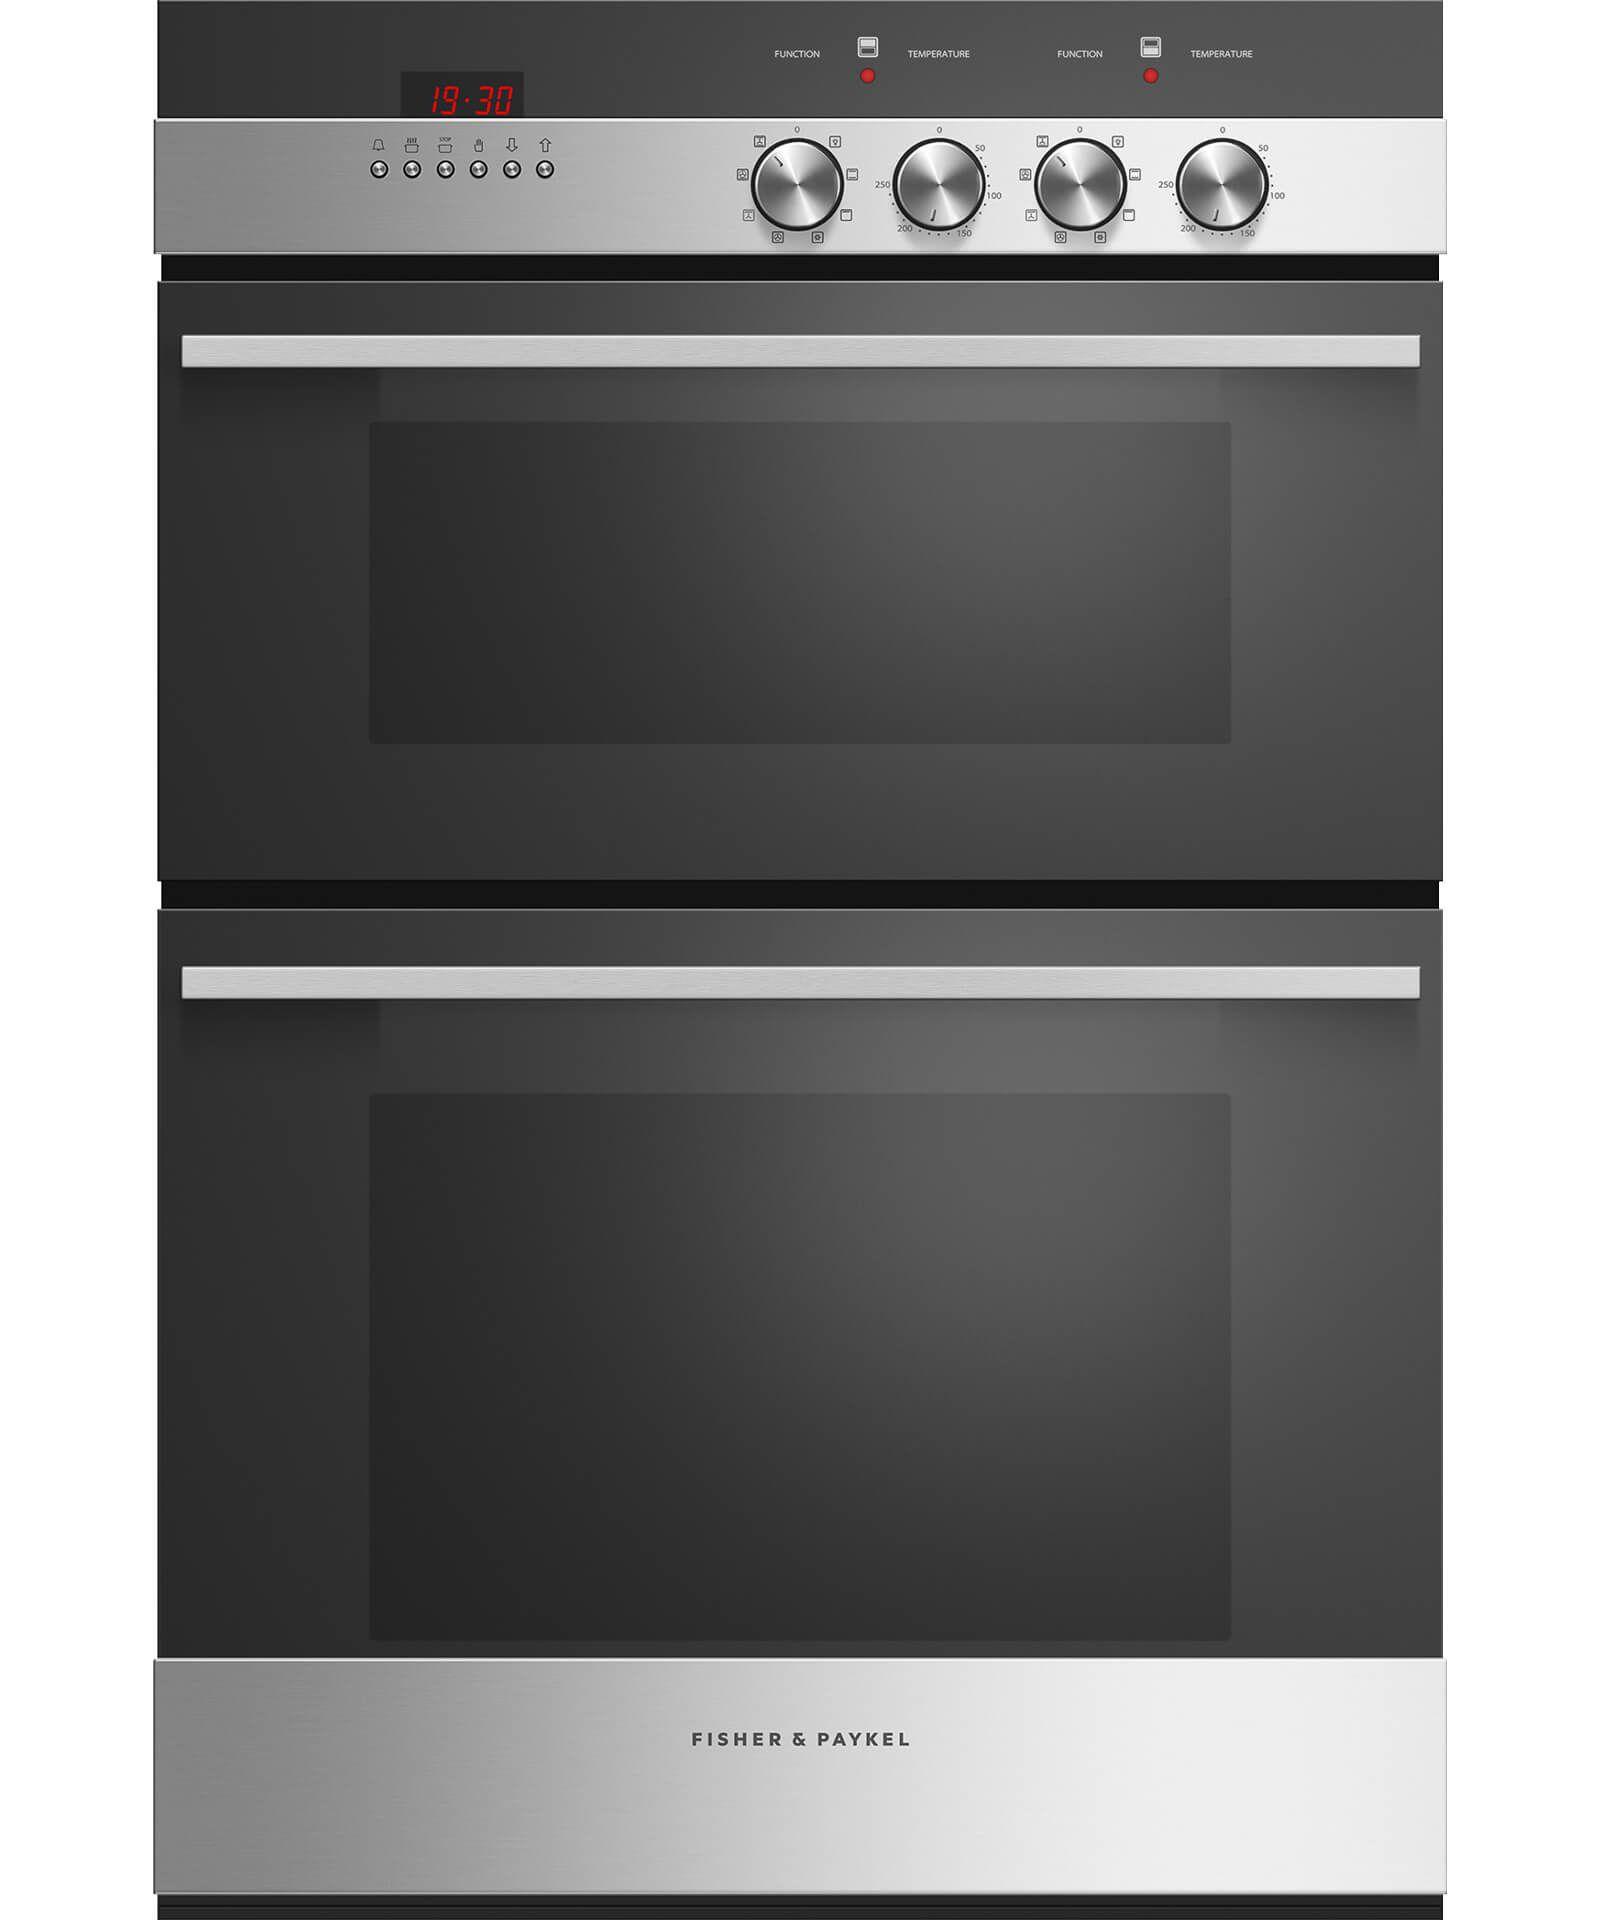 kitchenaid double wall oven manual